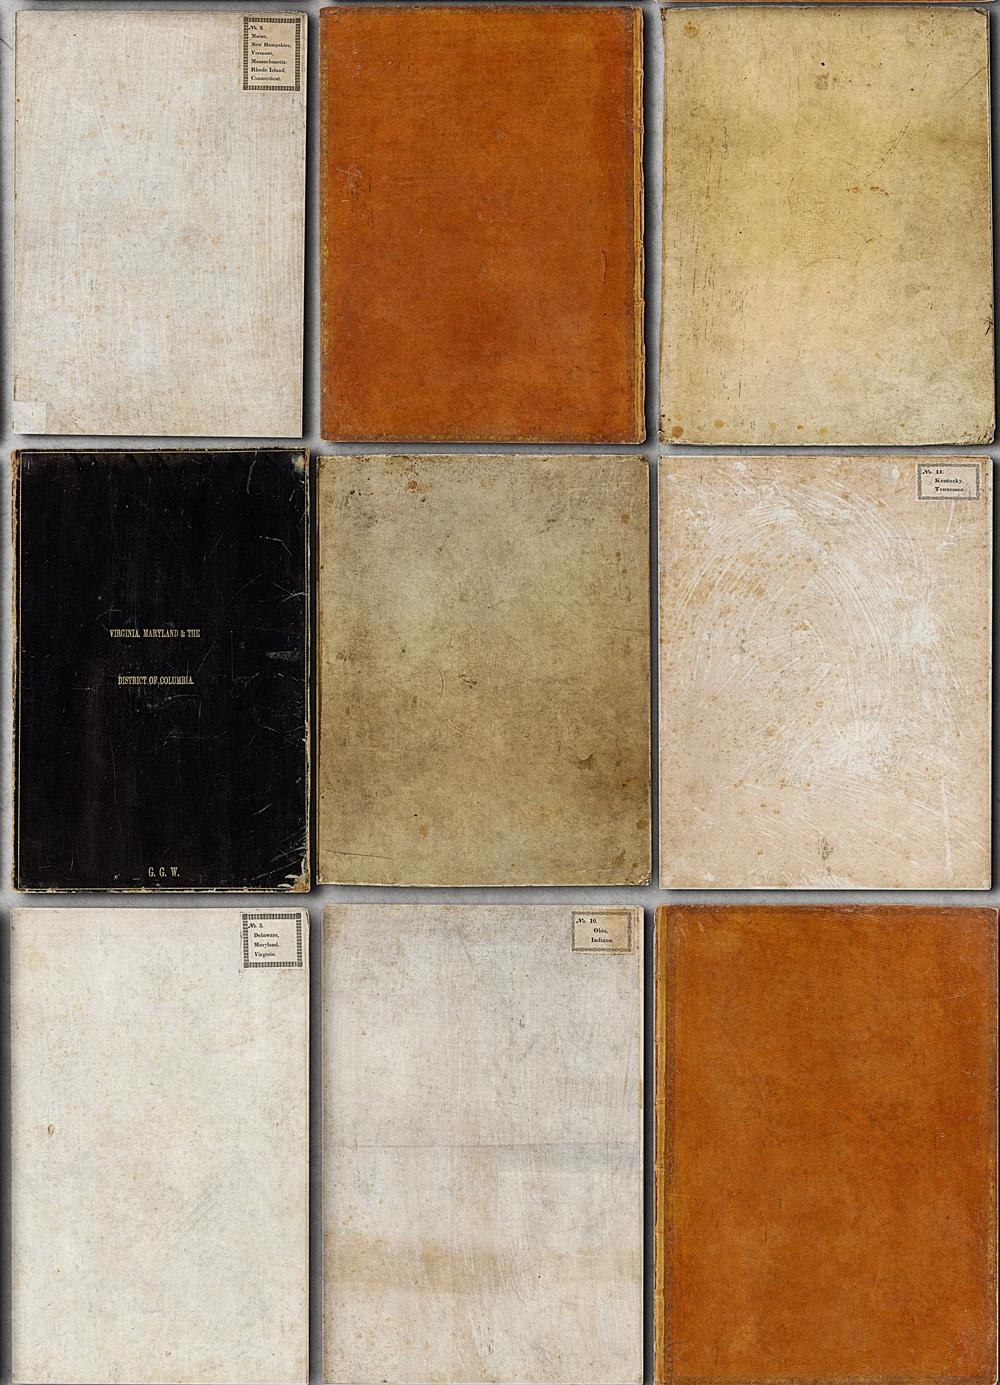 Tapet Designer Nature Book Covers Mindthegap